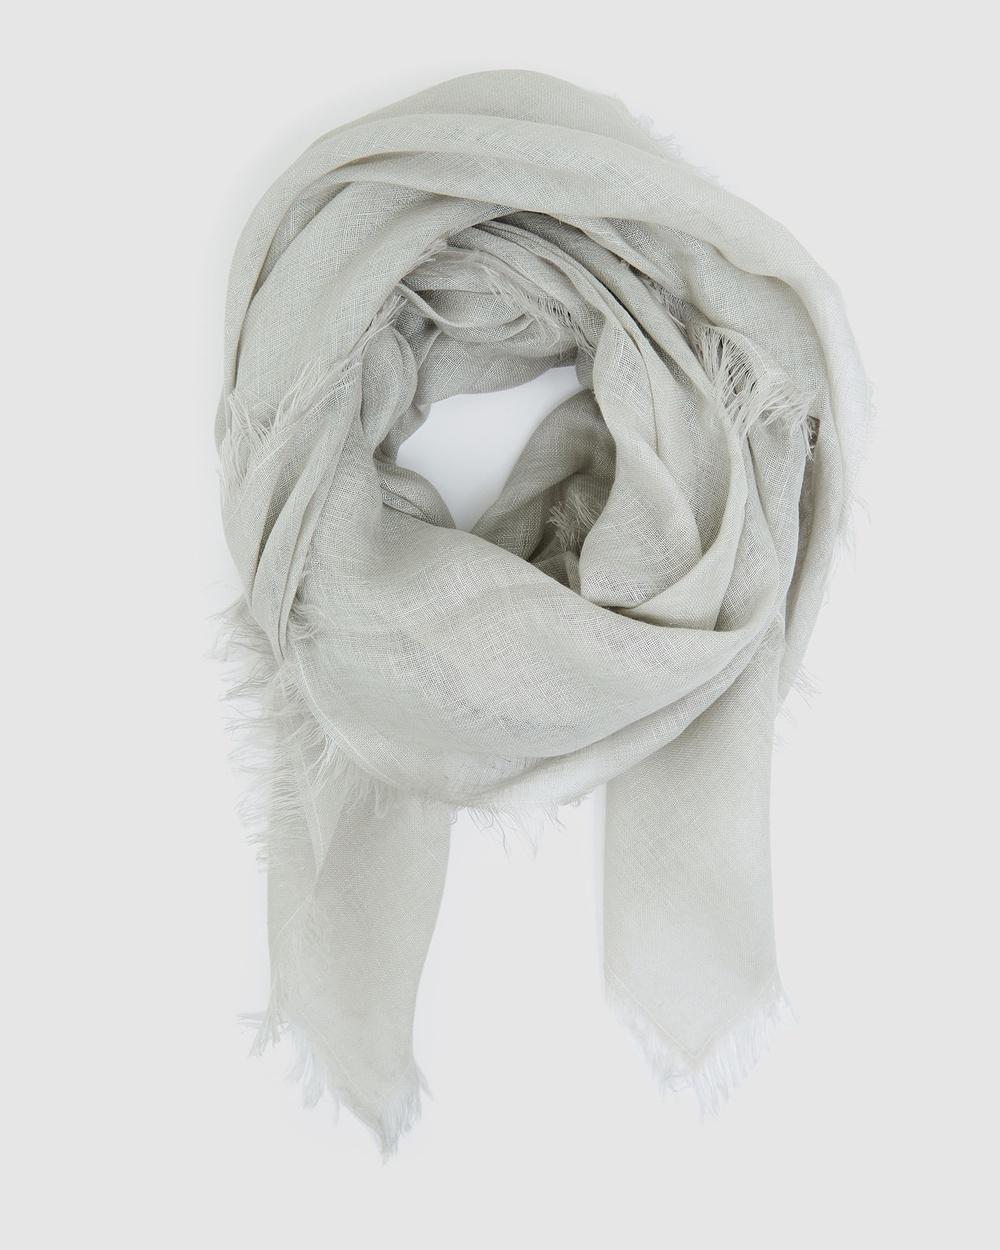 Cloth & Co. Hand Loomed Linen Scarf Scarves Gloves Winter Fog